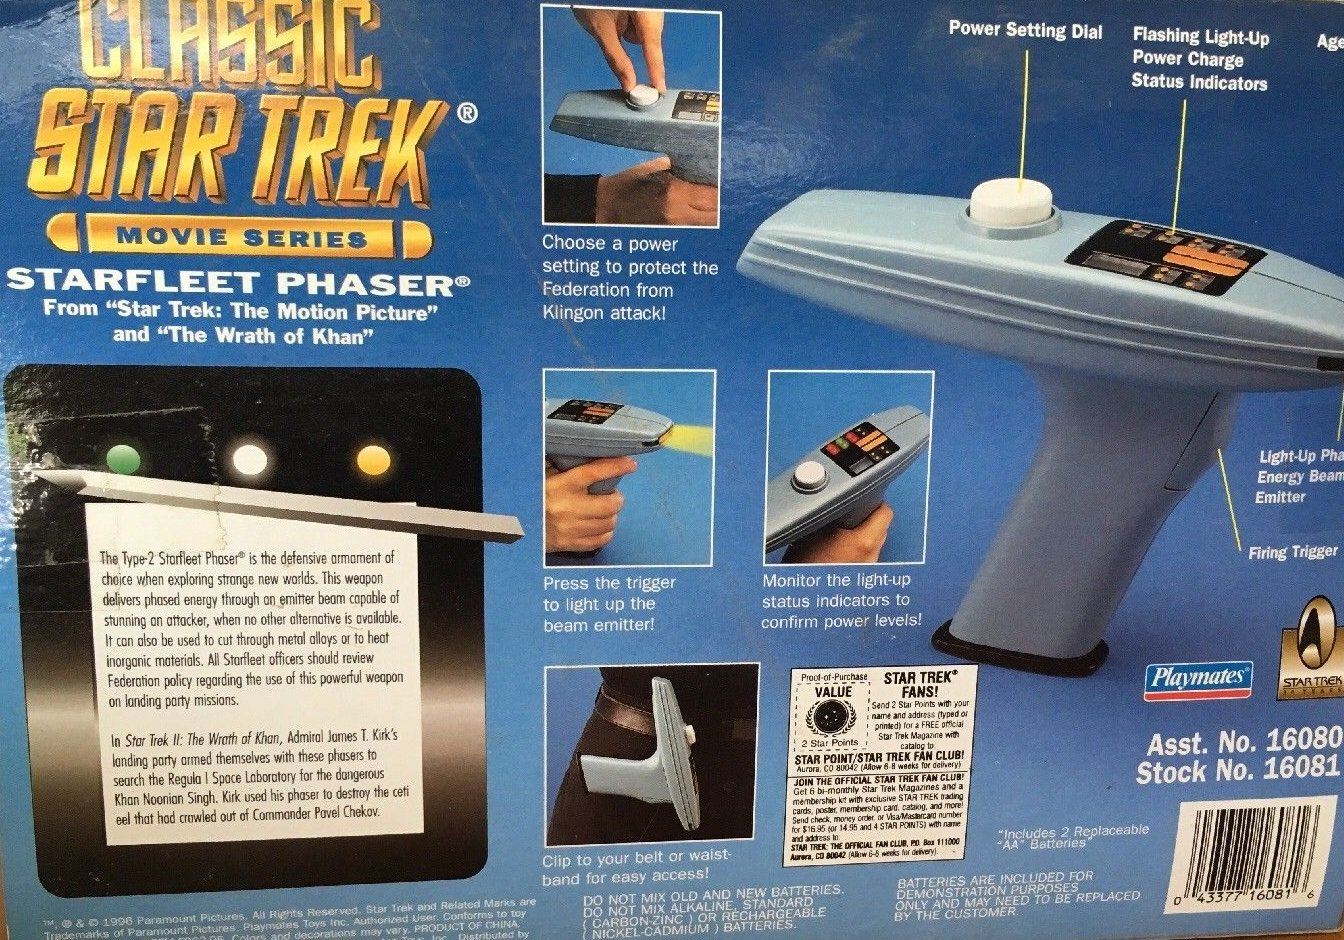 Star Trek Classic Movie Series Starfleet Phaser